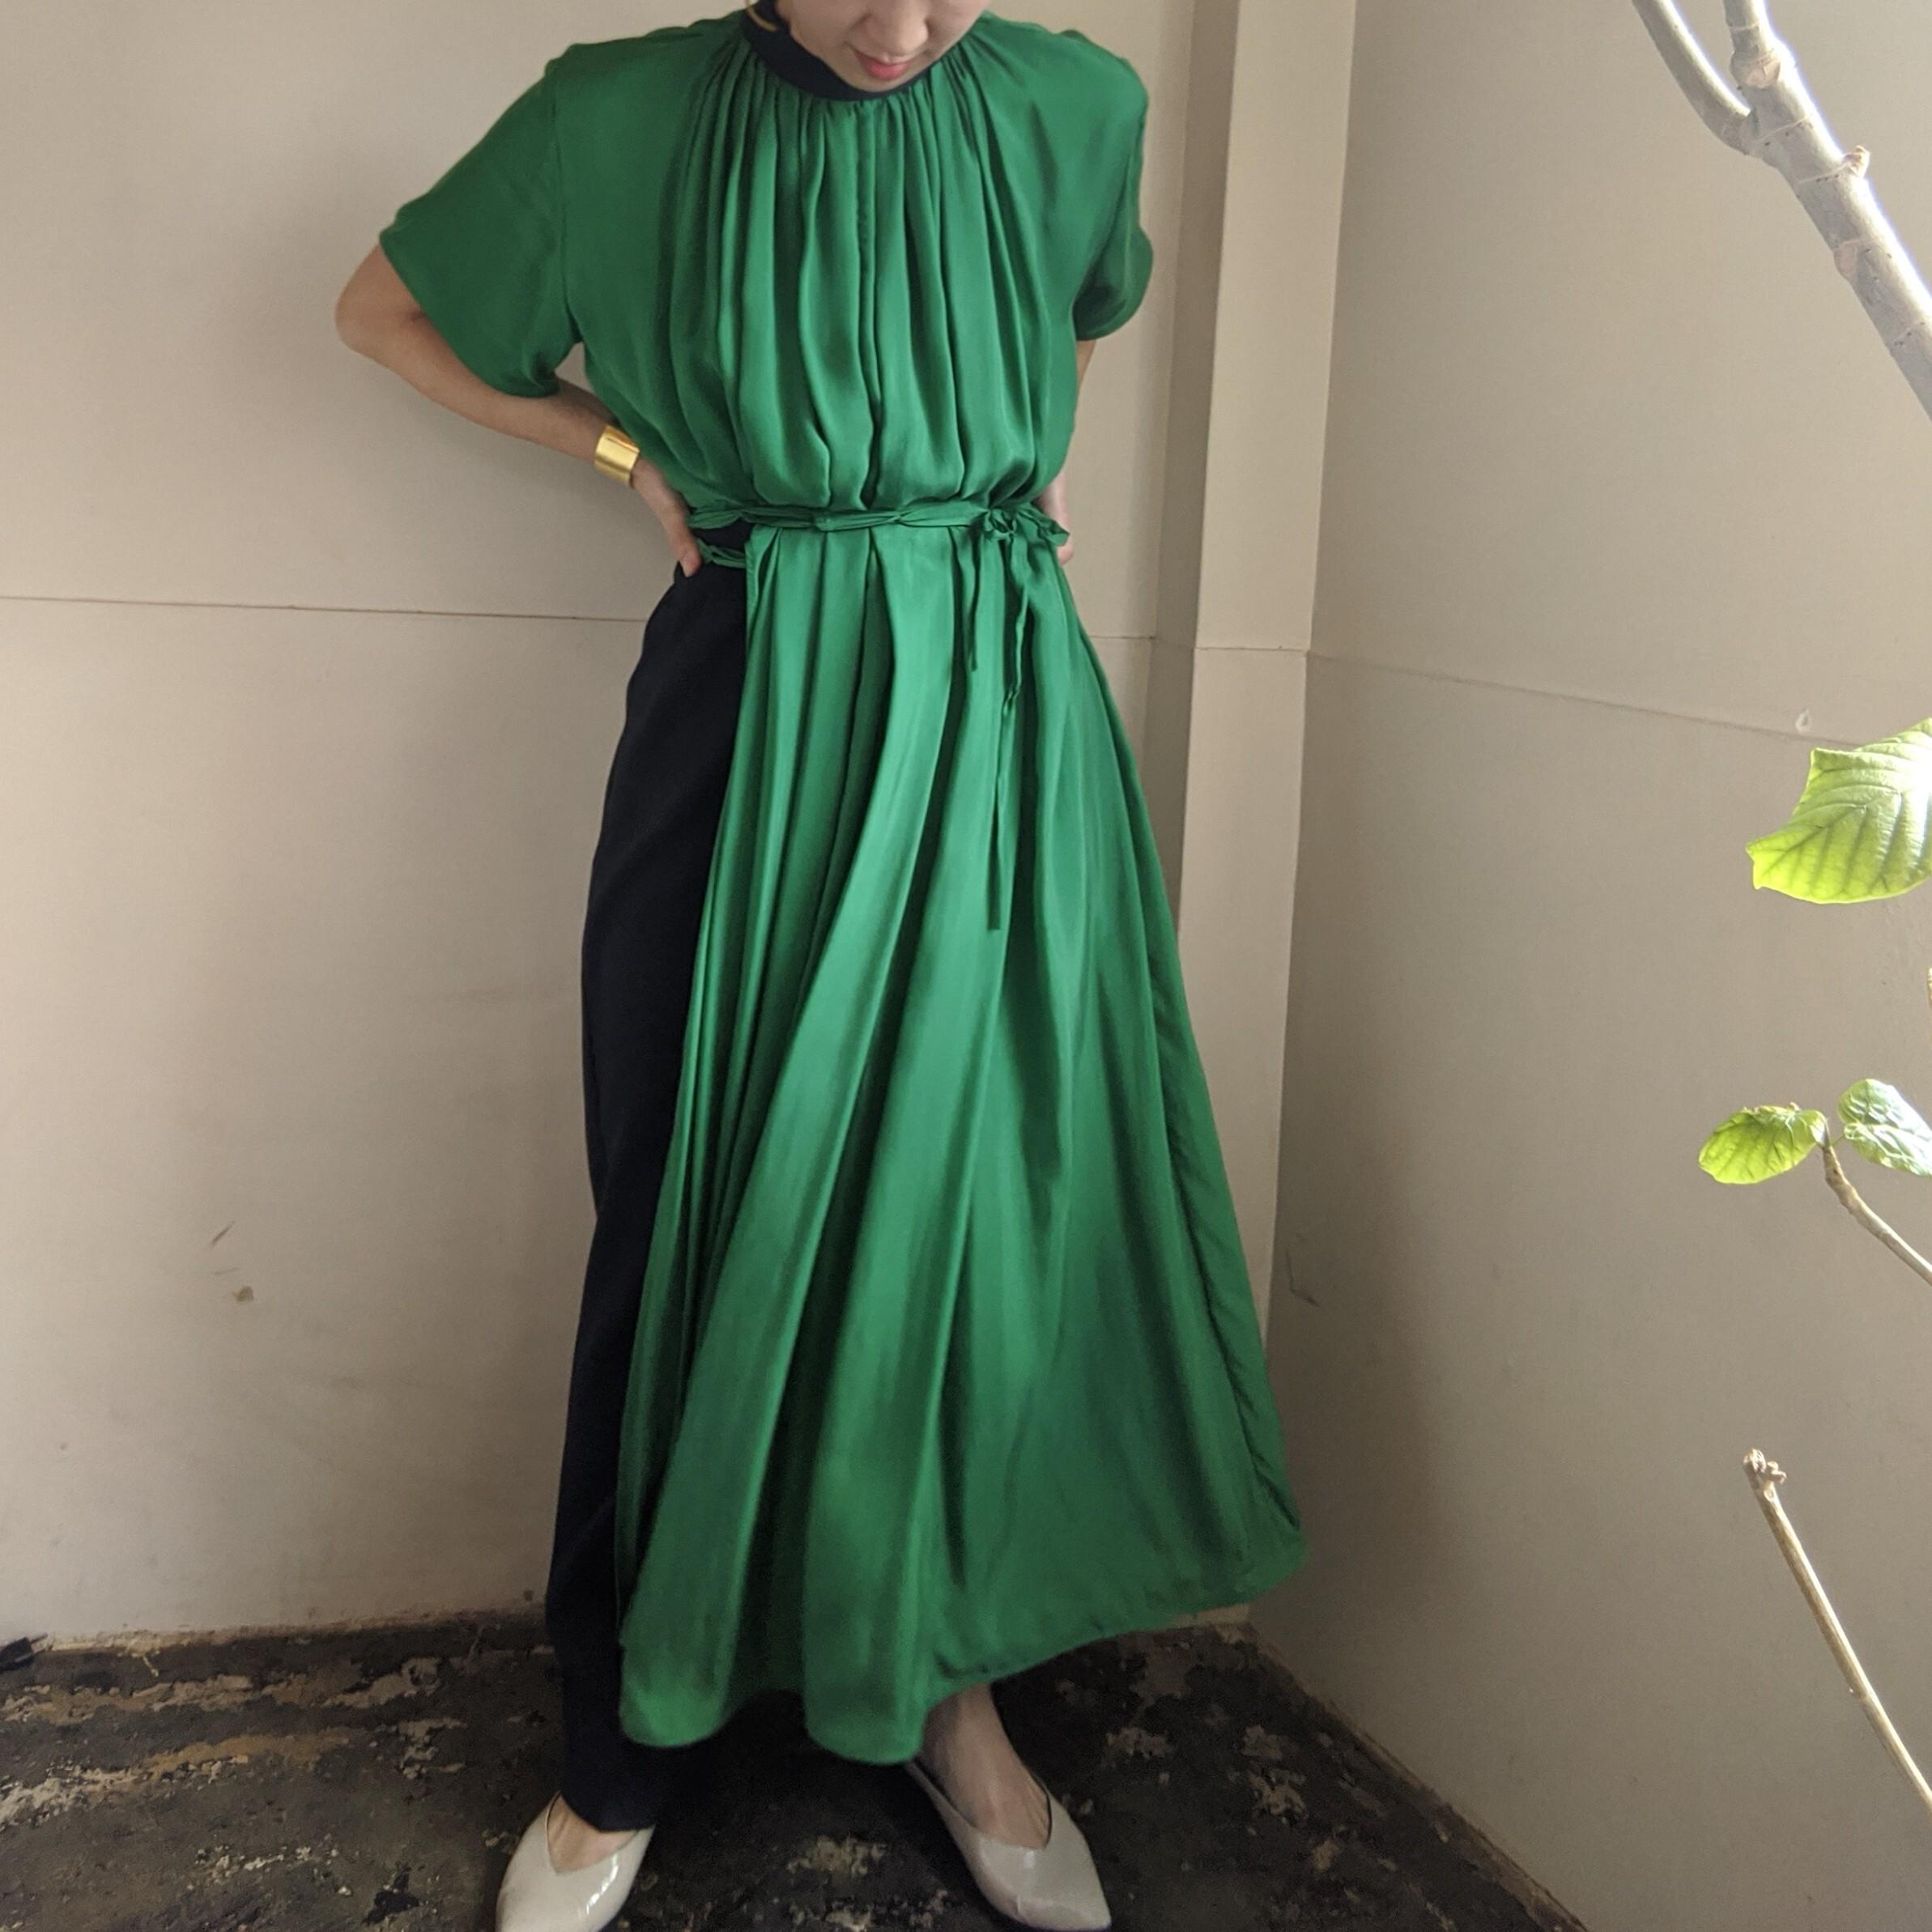 【 AKIRAFURUKAWA 】cupro all in one / オールインワン グレンチェック グリーン GREEN